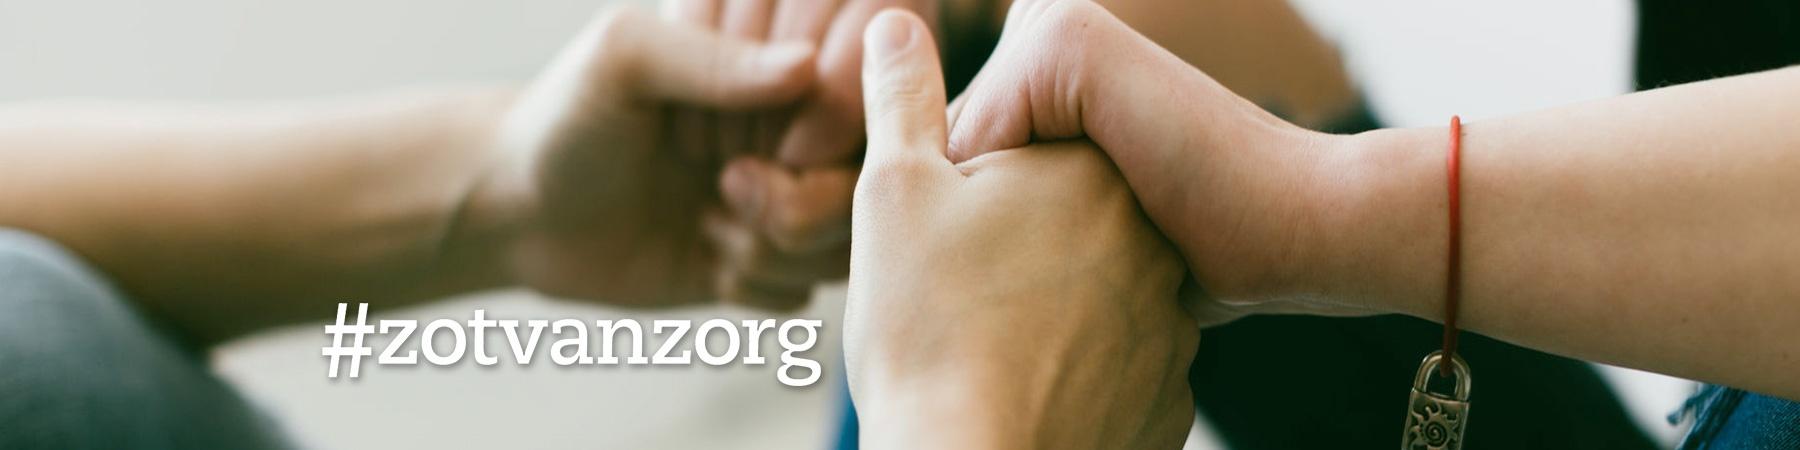 zotvanzorg_website_1_10.jpg